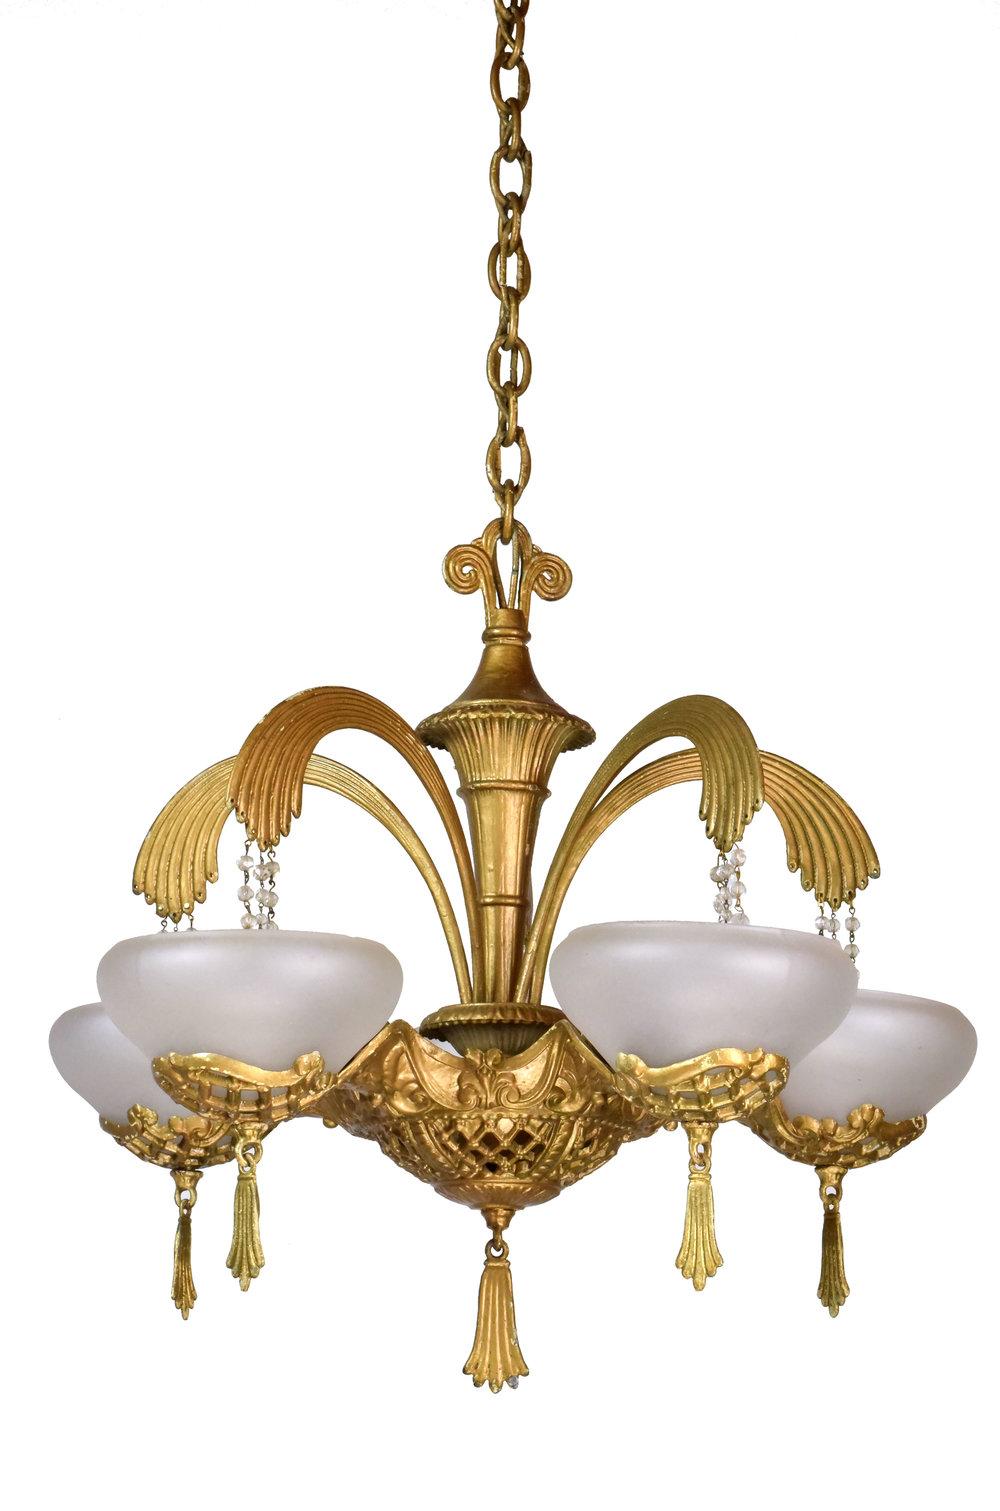 46566-art-deco-brass-chandelier-front-view.jpg